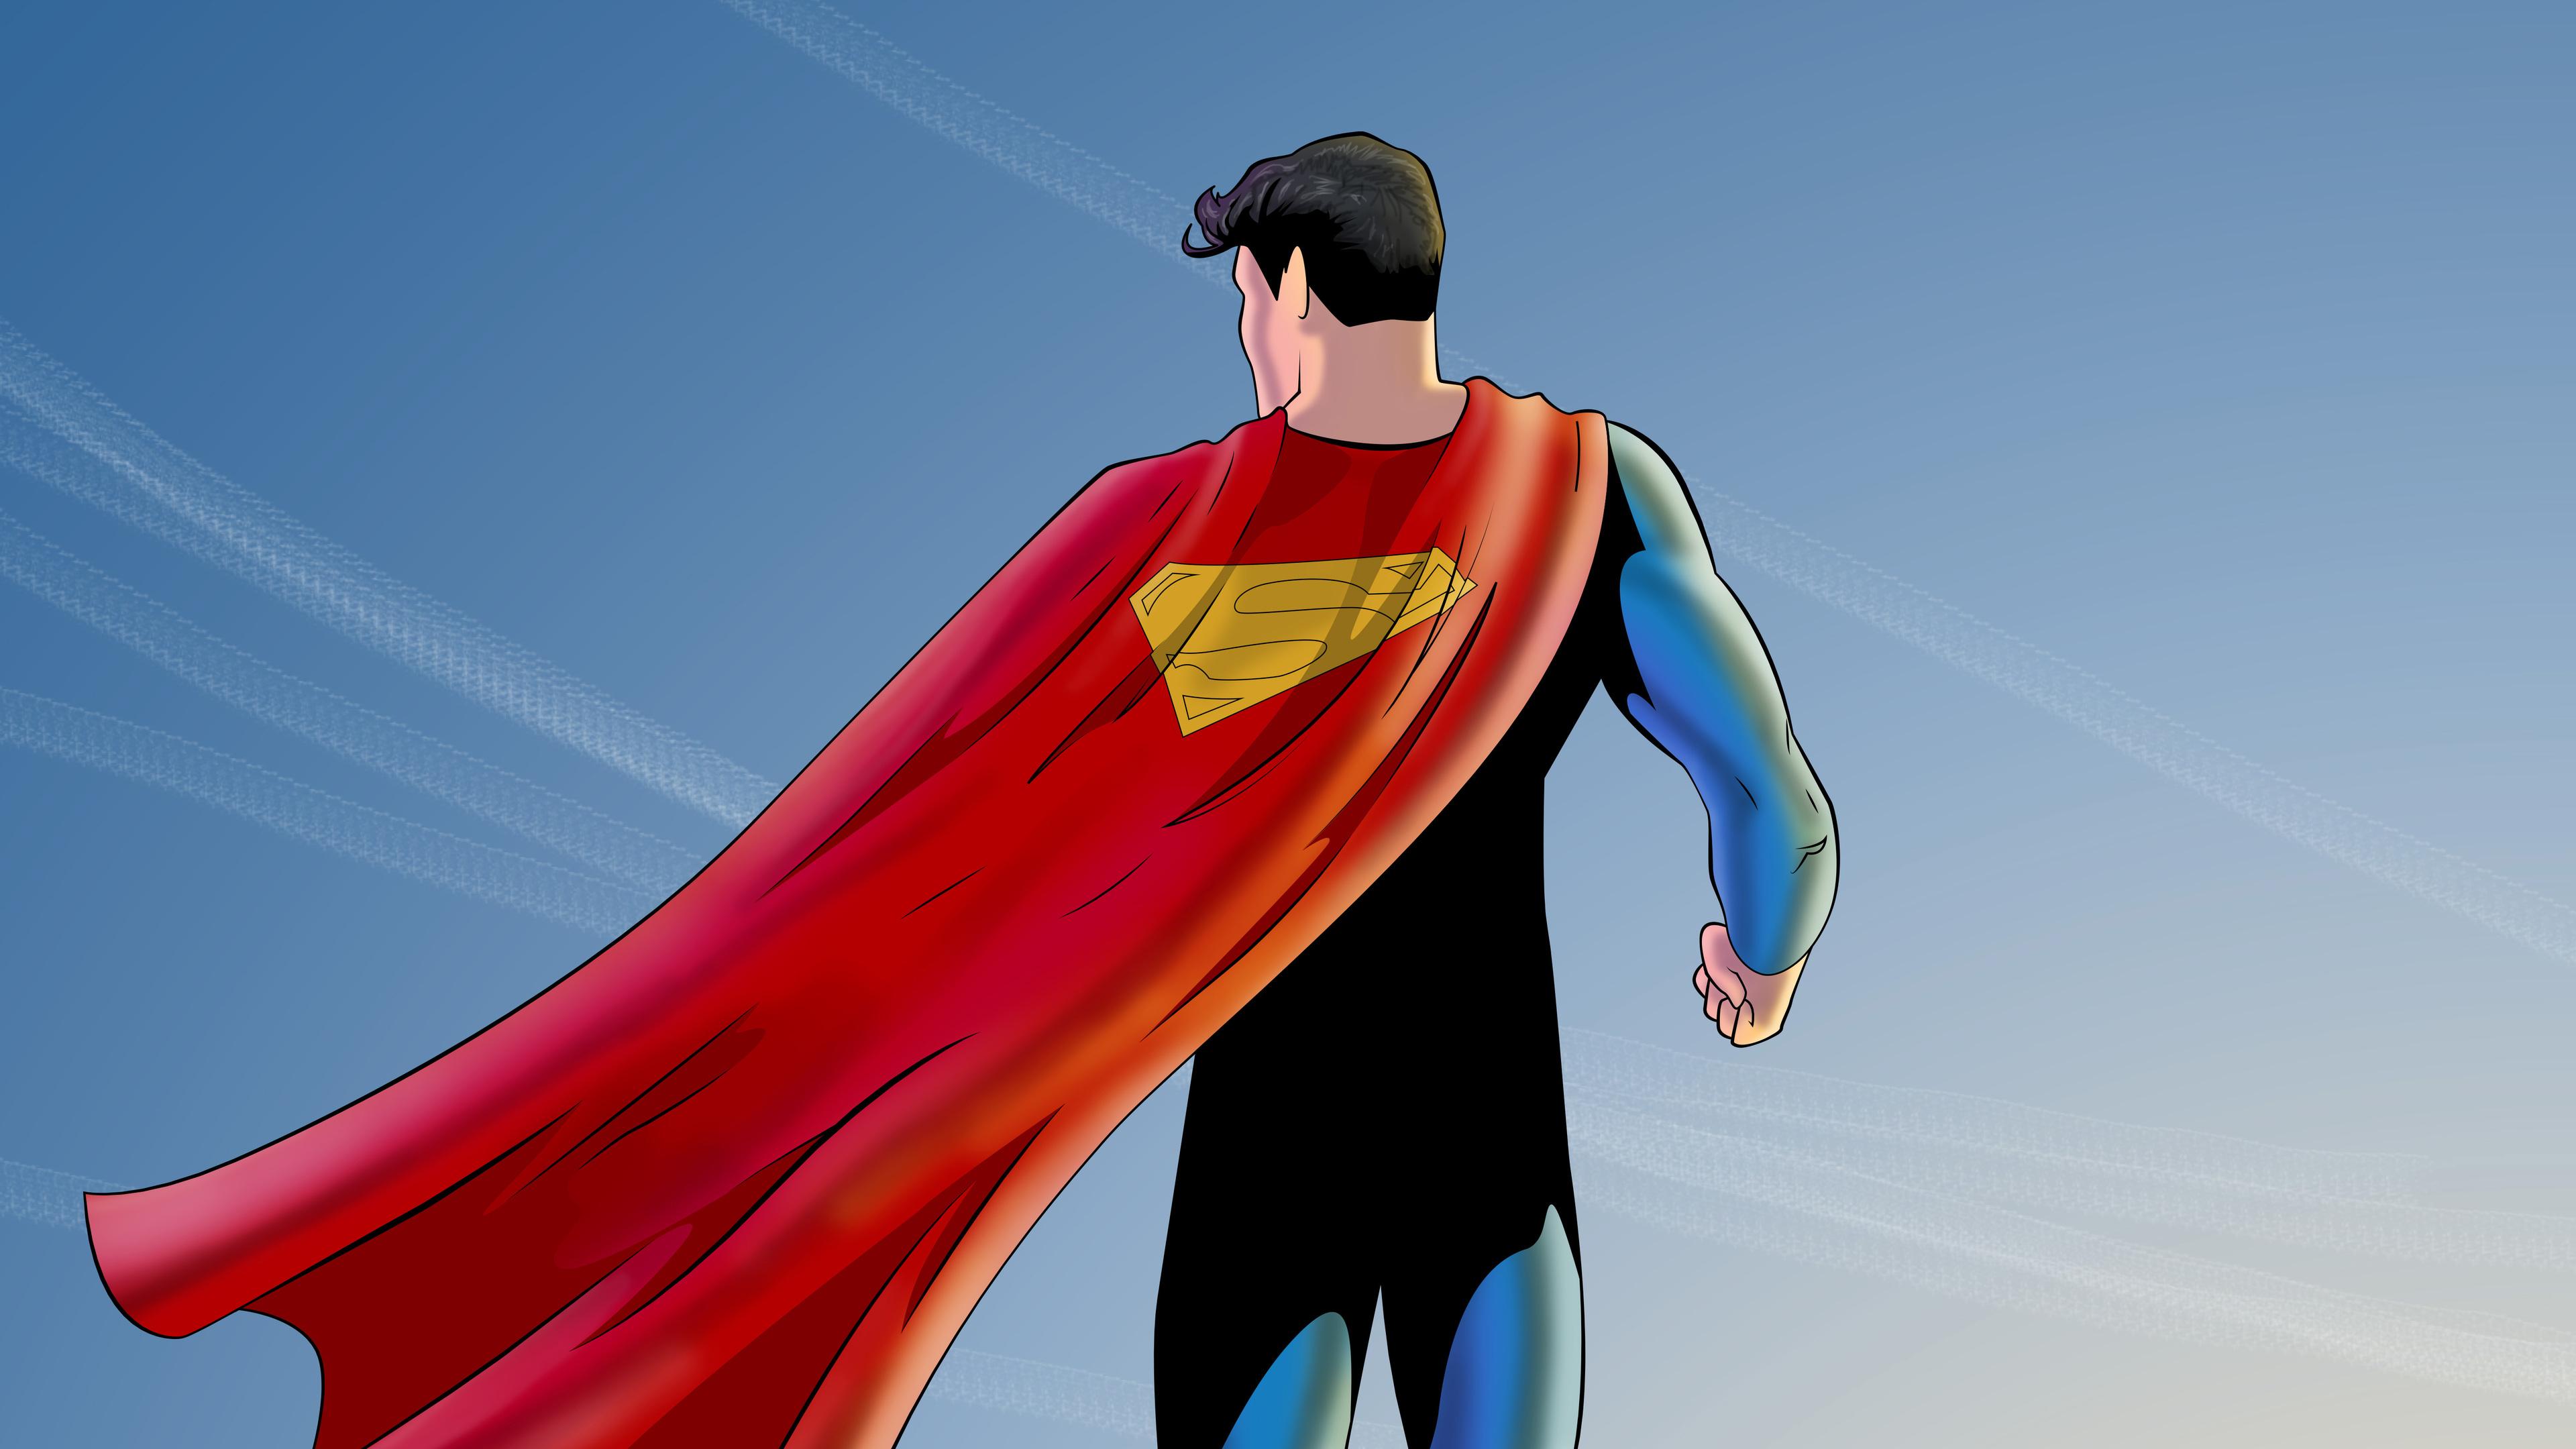 Batman Superman Iphone Wallpaper Superman And The Sun Artwork 5k Superman Wallpapers